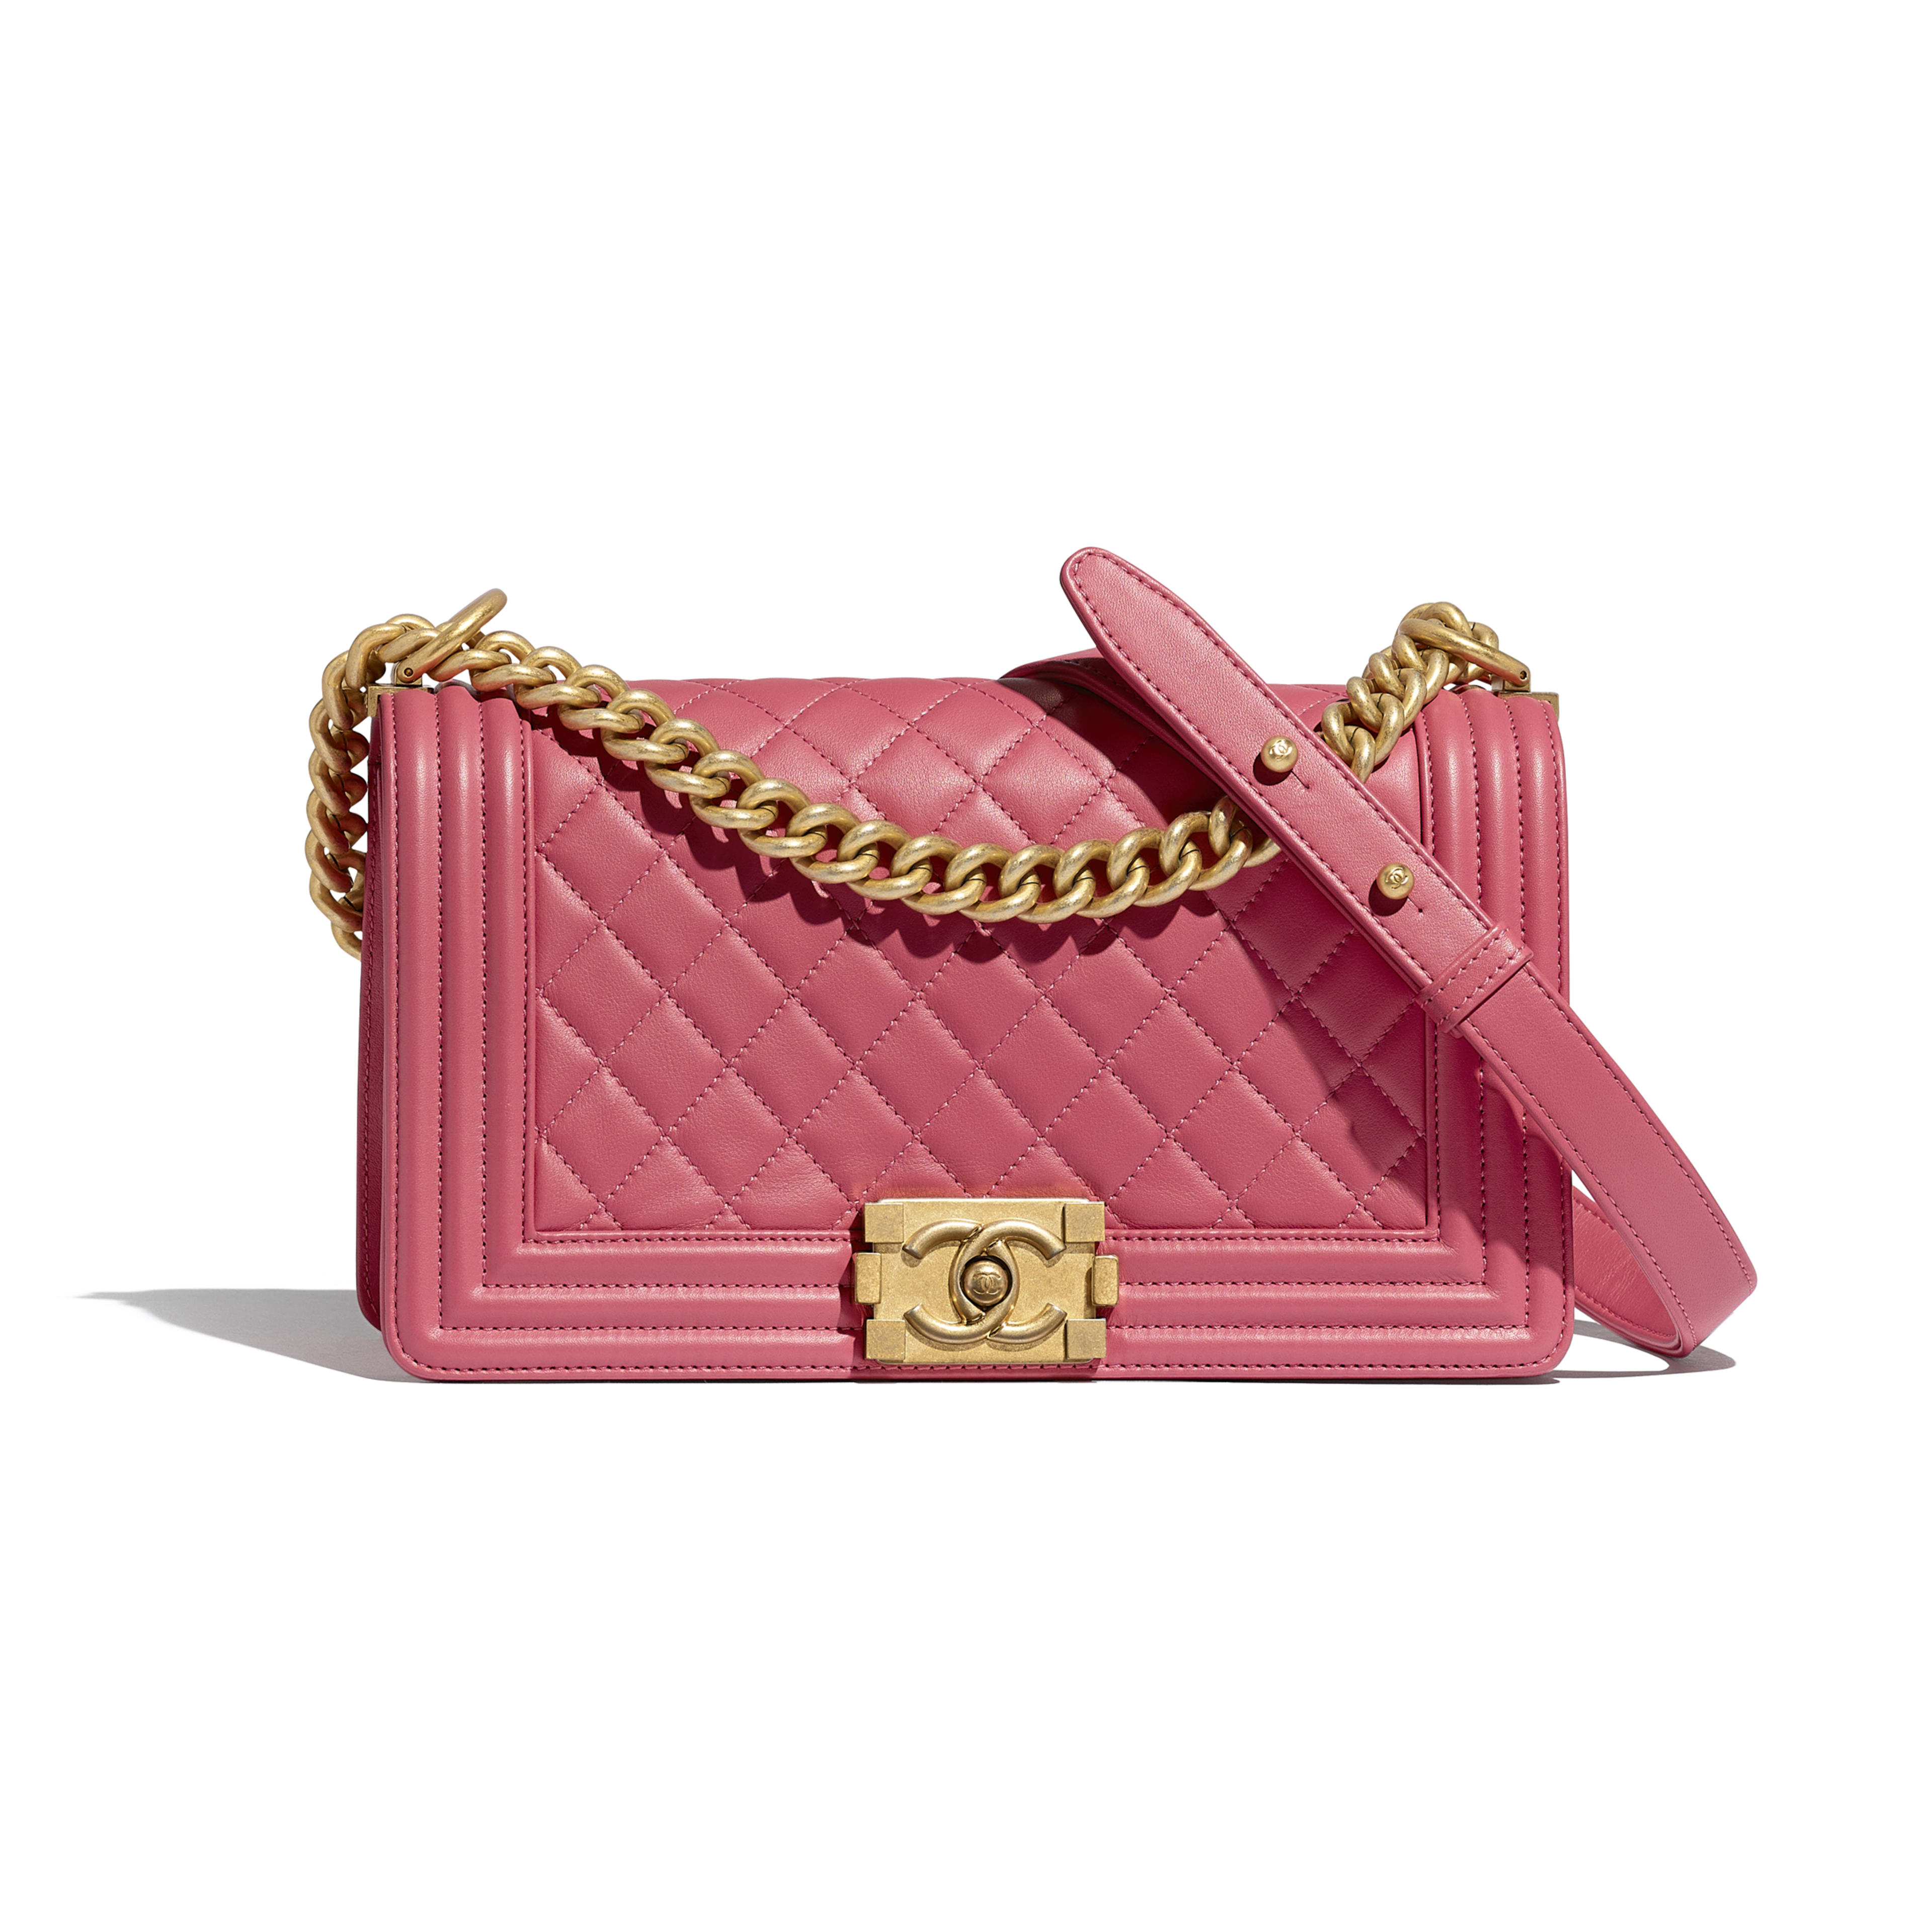 Gold Tone Metal Pink Boy Chanel Handbag